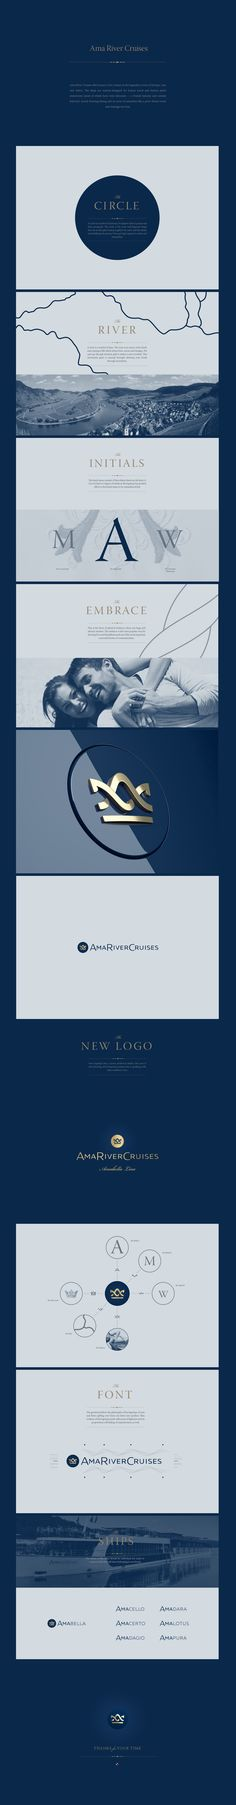 Ama River Cruises by Denis Ulyanov, via Behance #logodesign #logo #logotype #design #branding #logoped #Russia